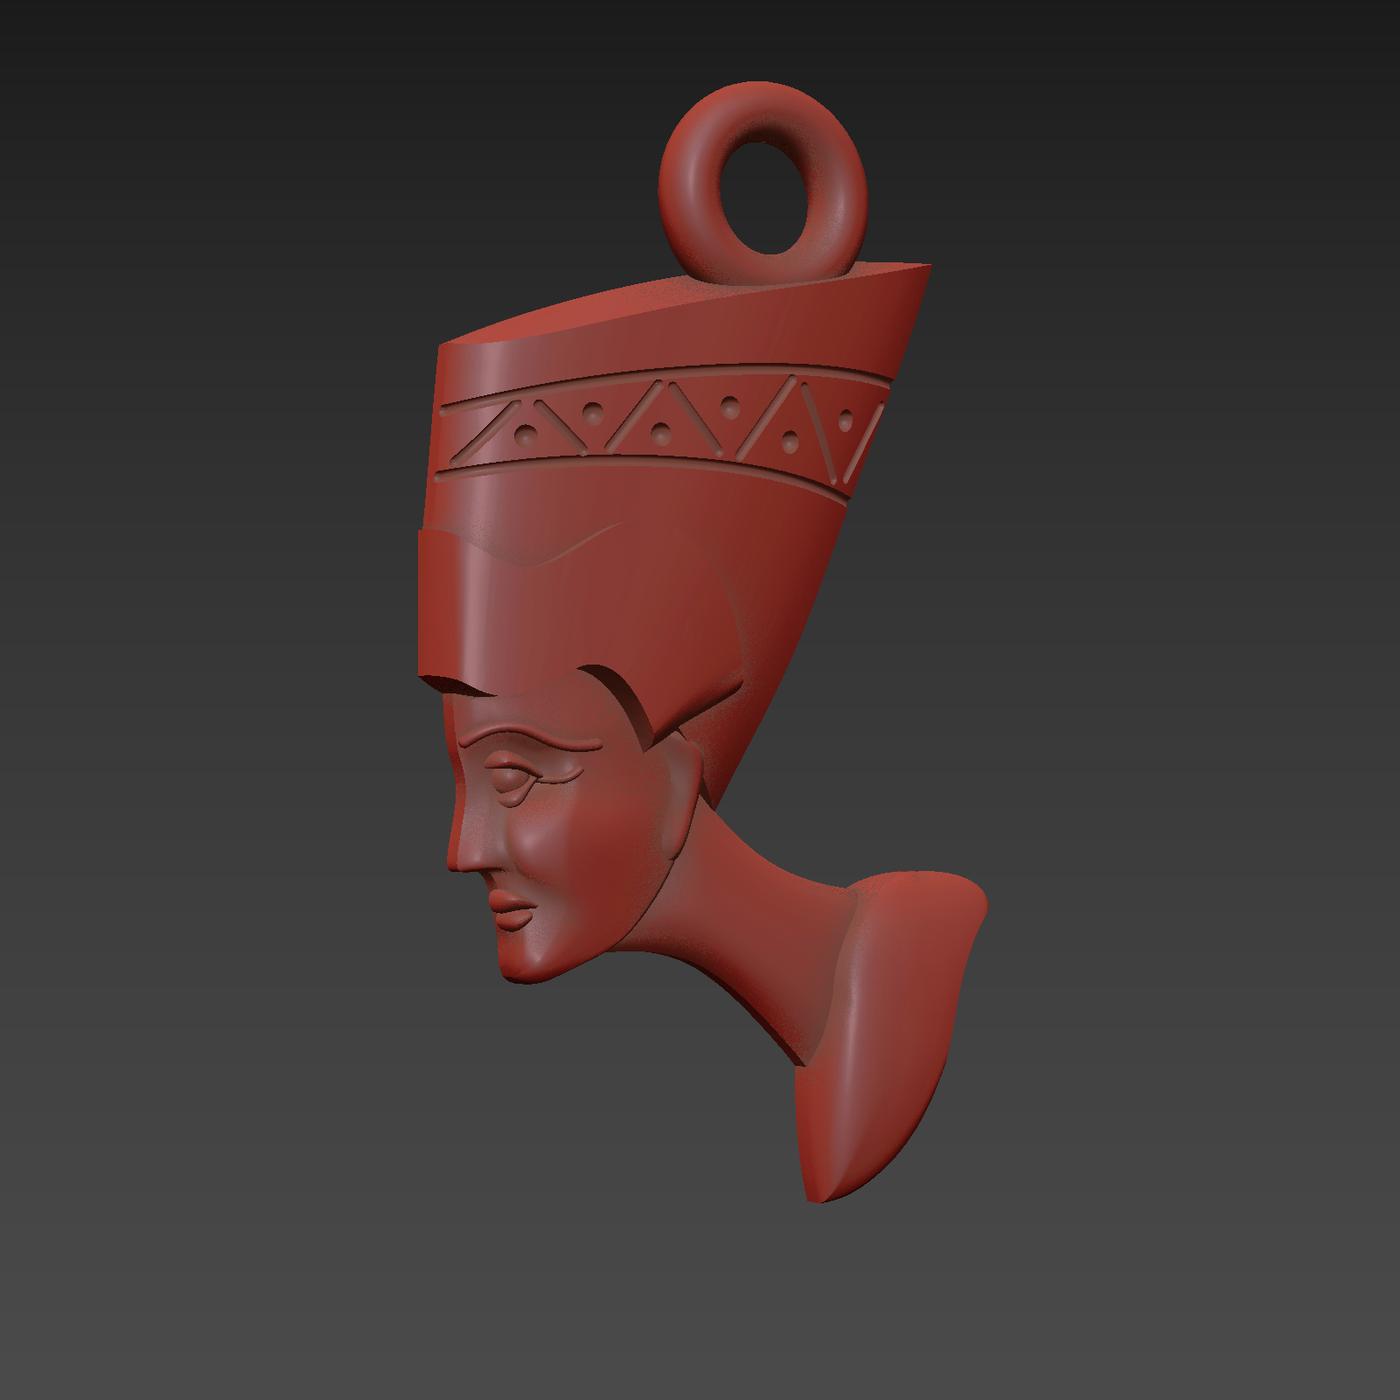 Nefertiti Egyptian human face symbol pendant jewelry gold necklace medallion 3d print model